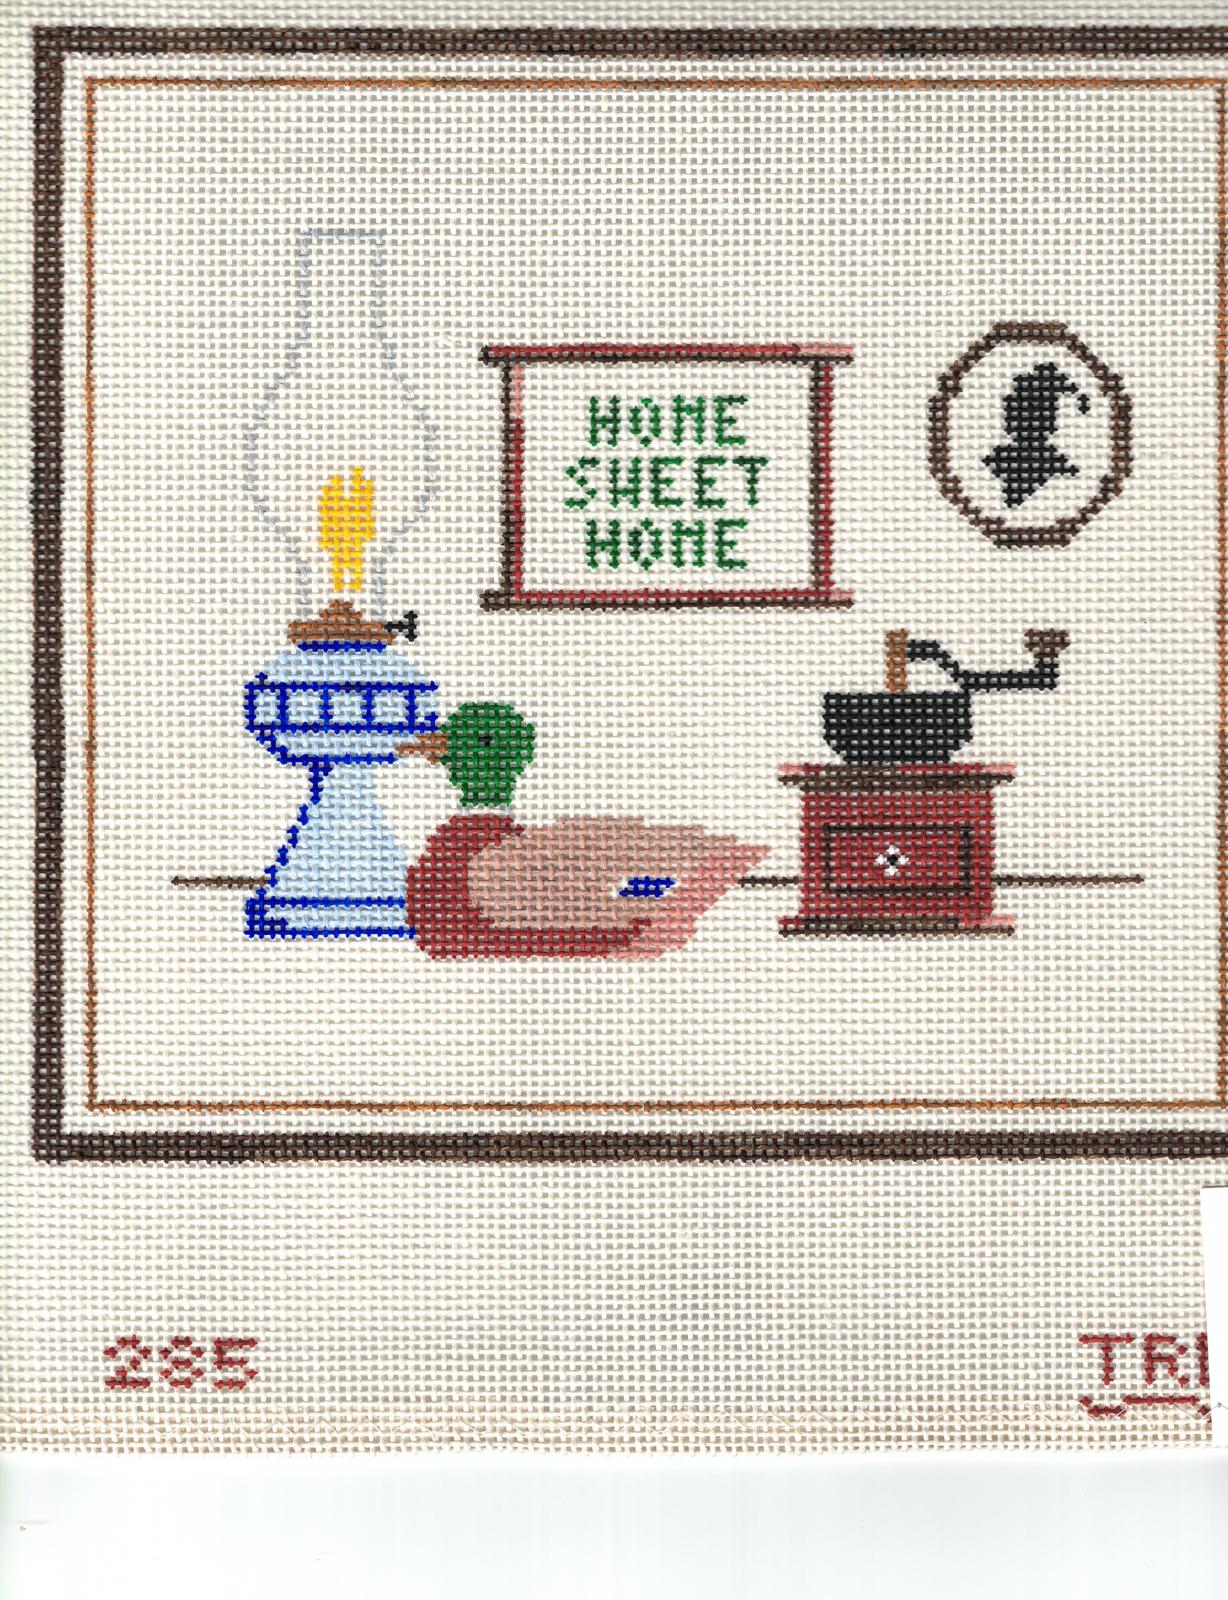 Home Sweet Home - Duck